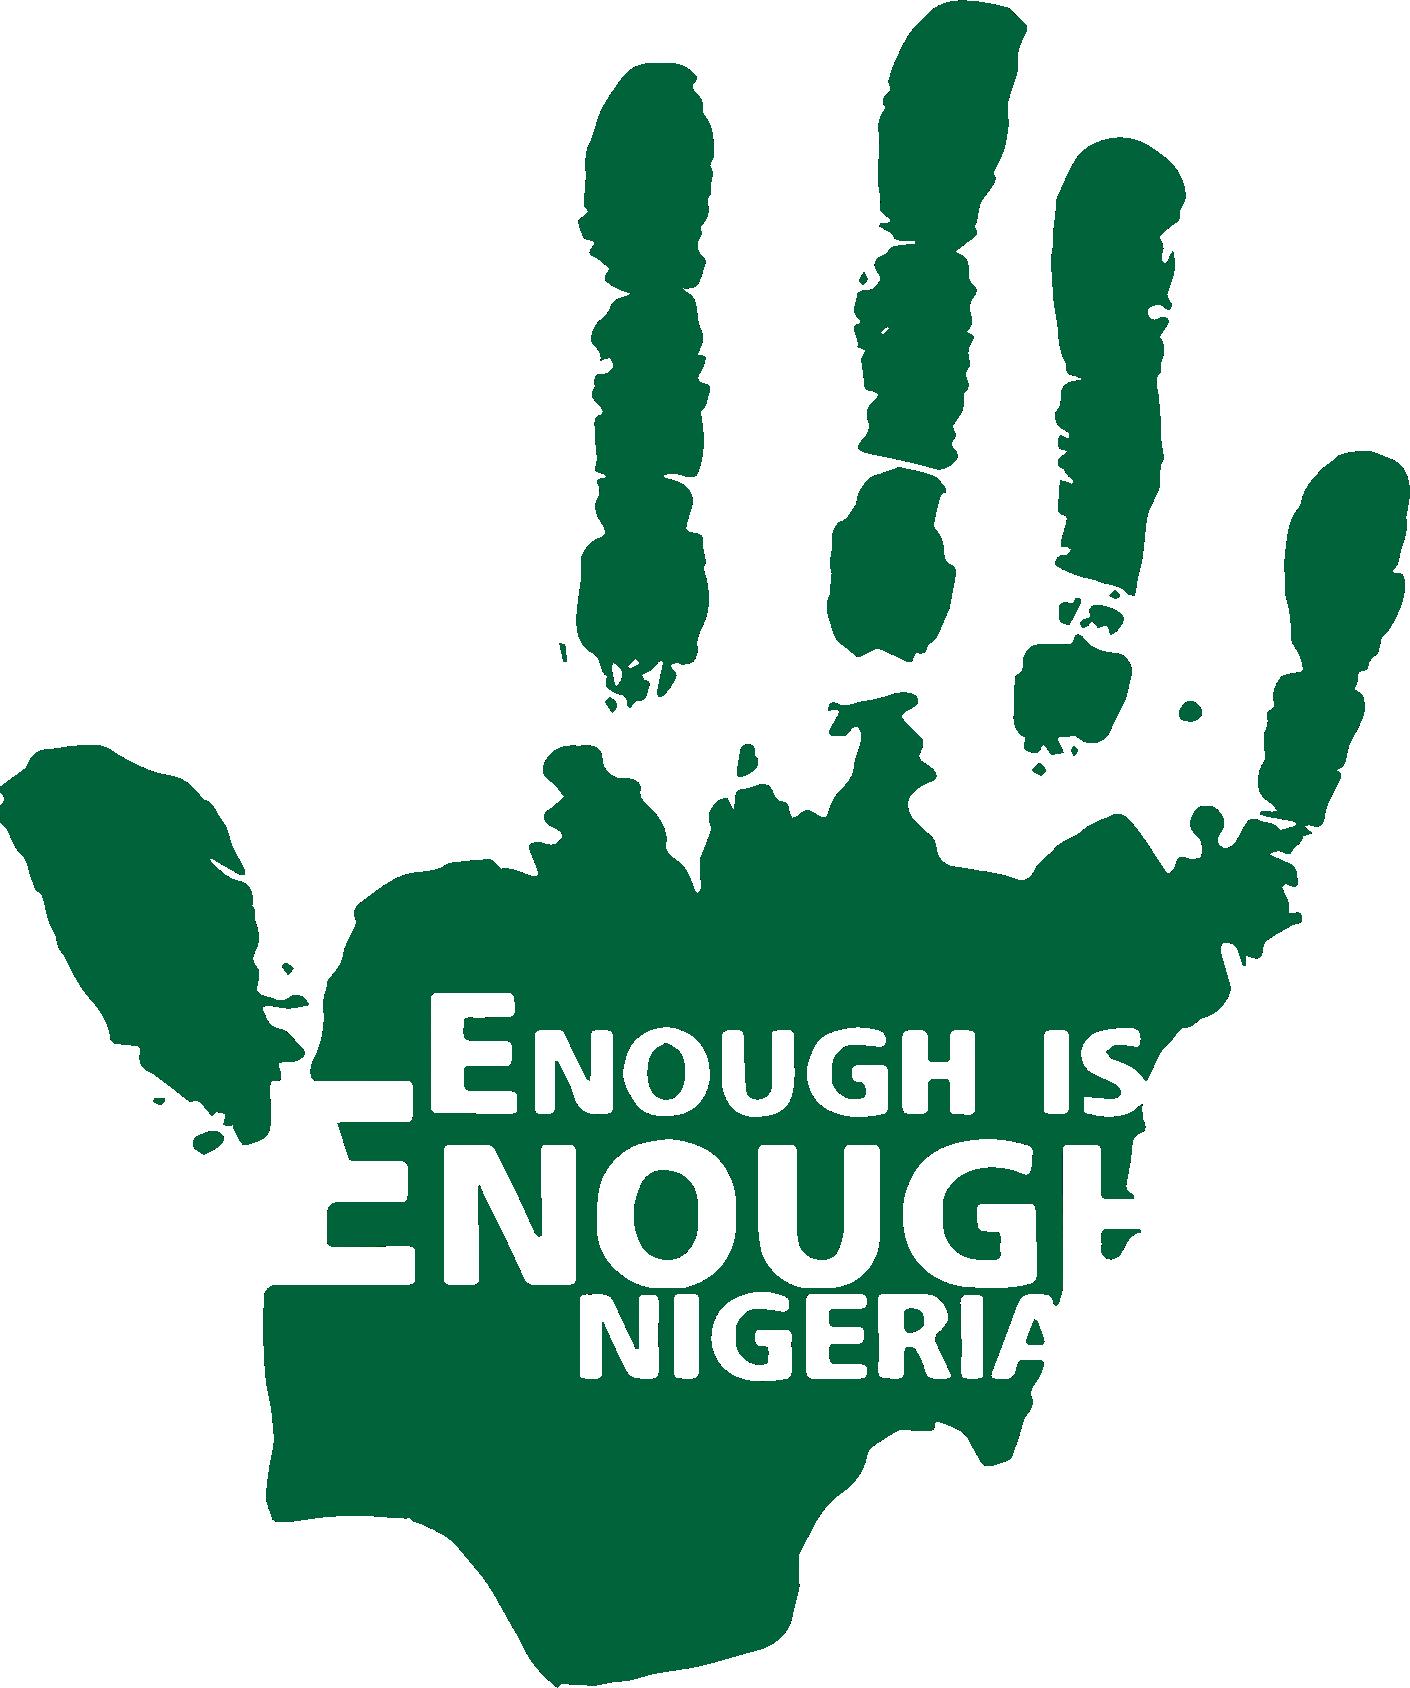 Enough is Enough Nigeria